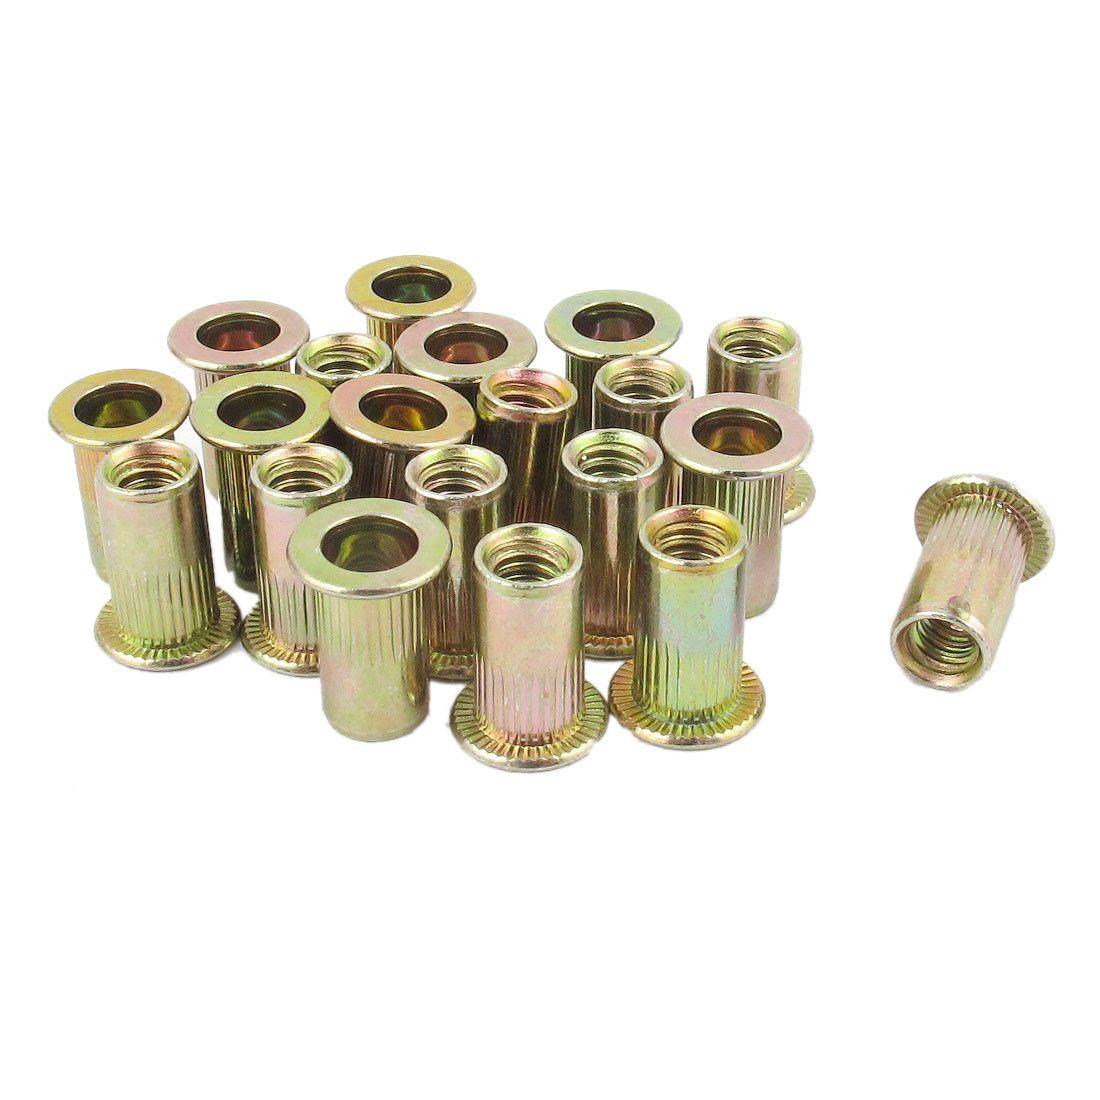 10-24 Aluminum Rivet Nut Rivnut Insert Nutsert SAE 100 pcs